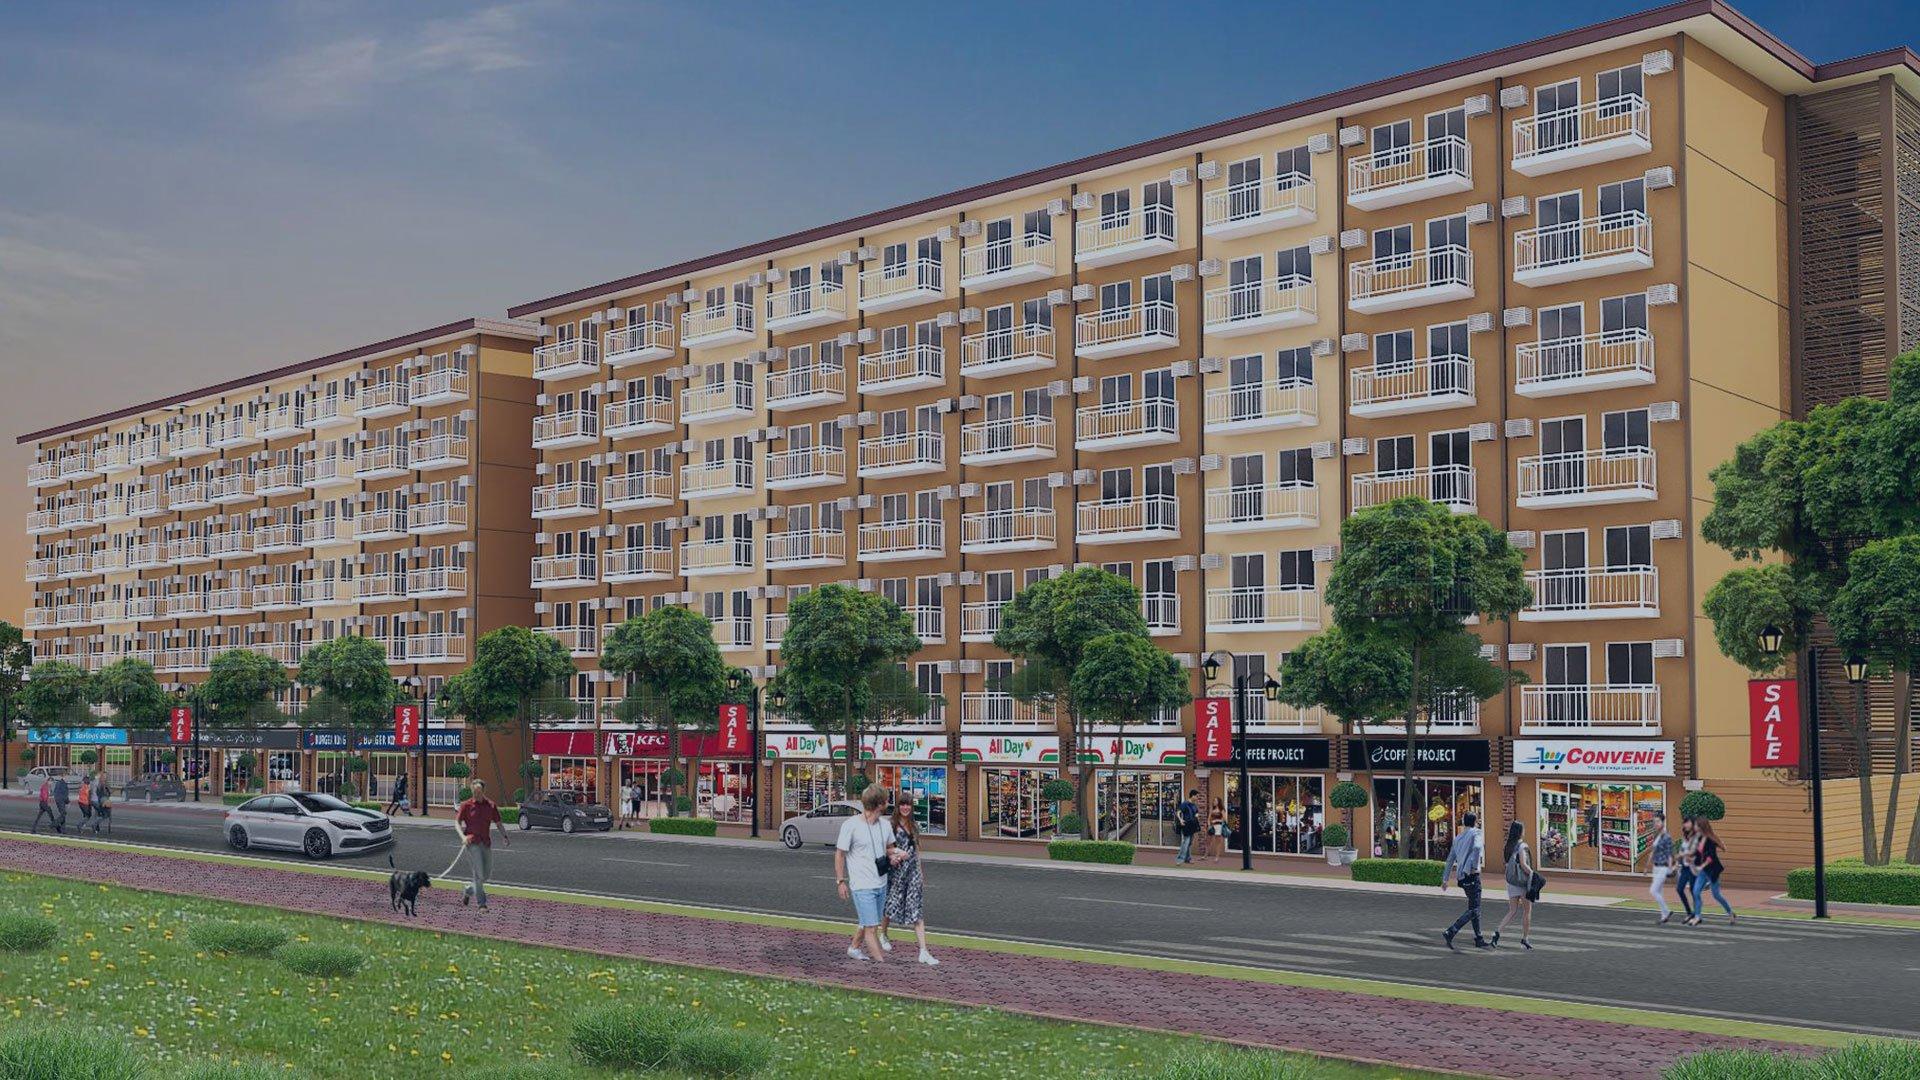 Camella Manors Verdant Puerto Princesa City